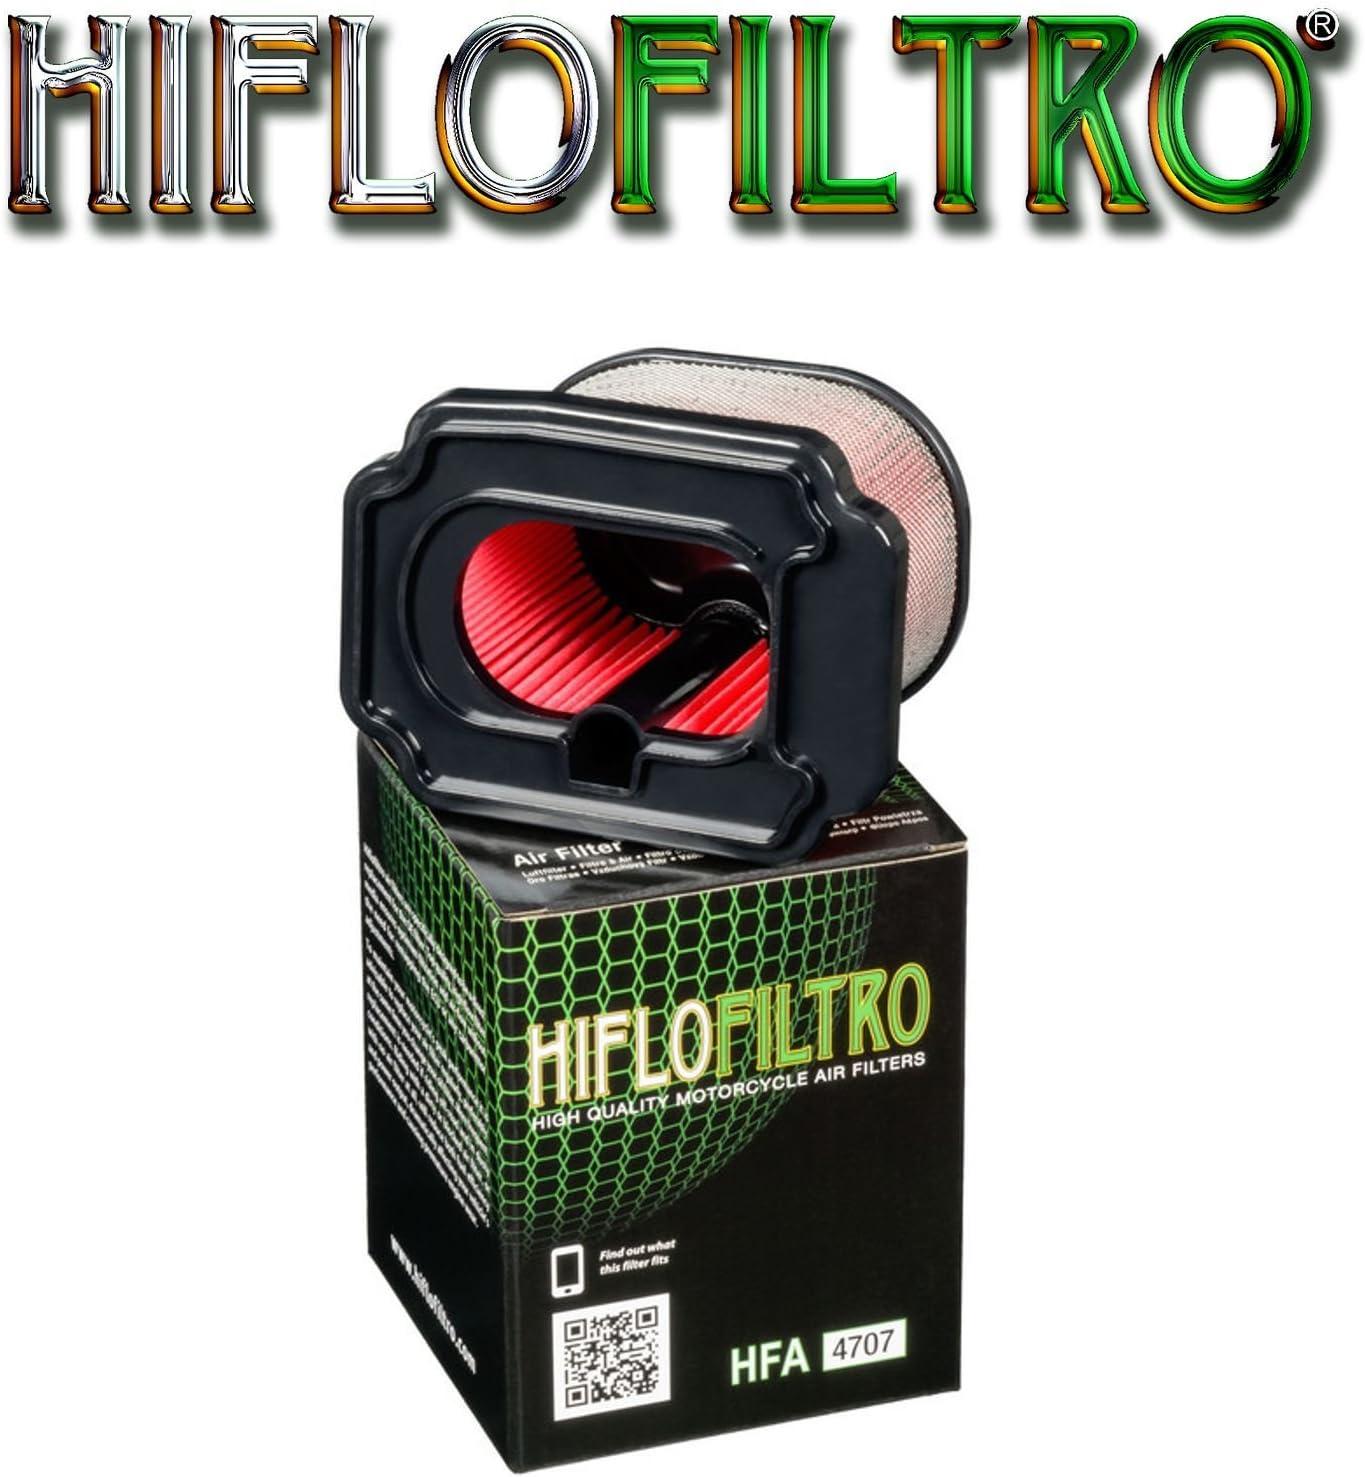 /2016 hfa4707/F/ür Yamaha MT-07/Moto Cage ABS 2015/ Luftfilter Hiflofiltro Code